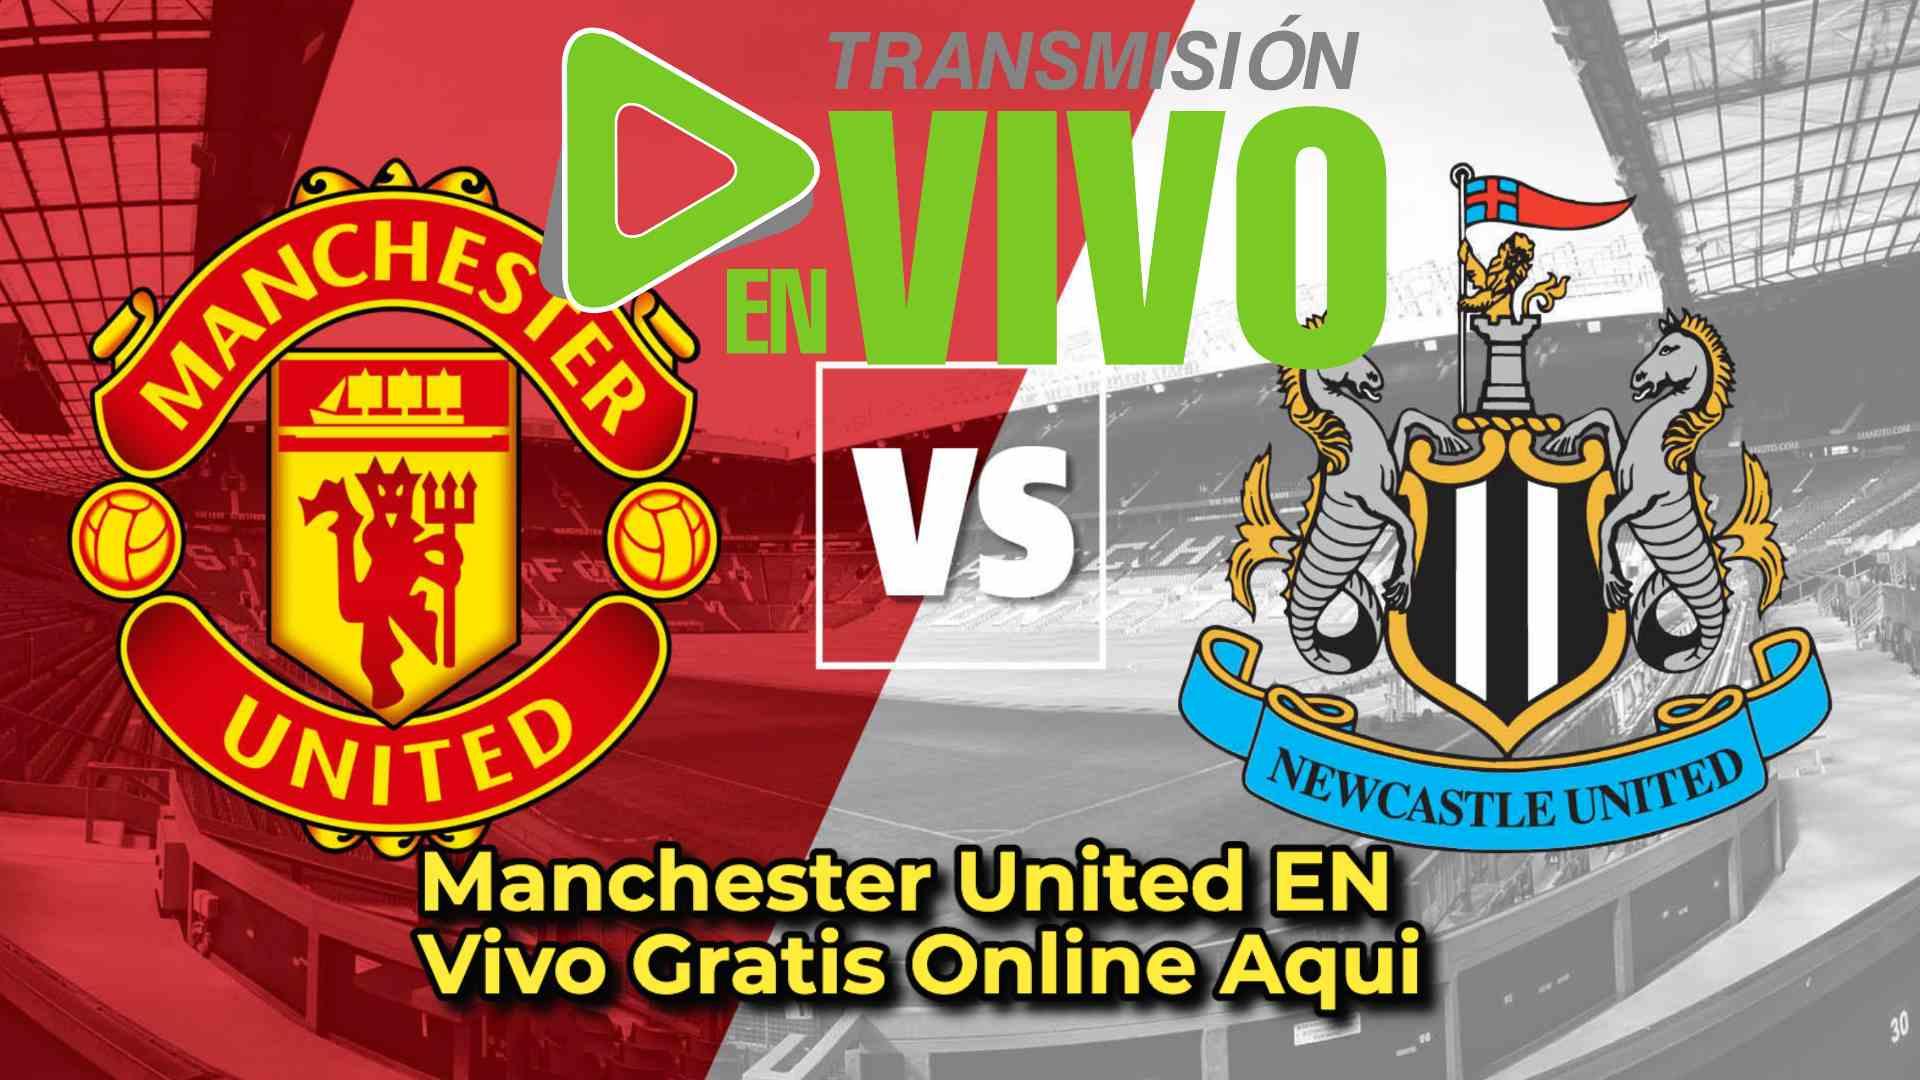 Manchester United EN Vivo Gratis Online Aqui